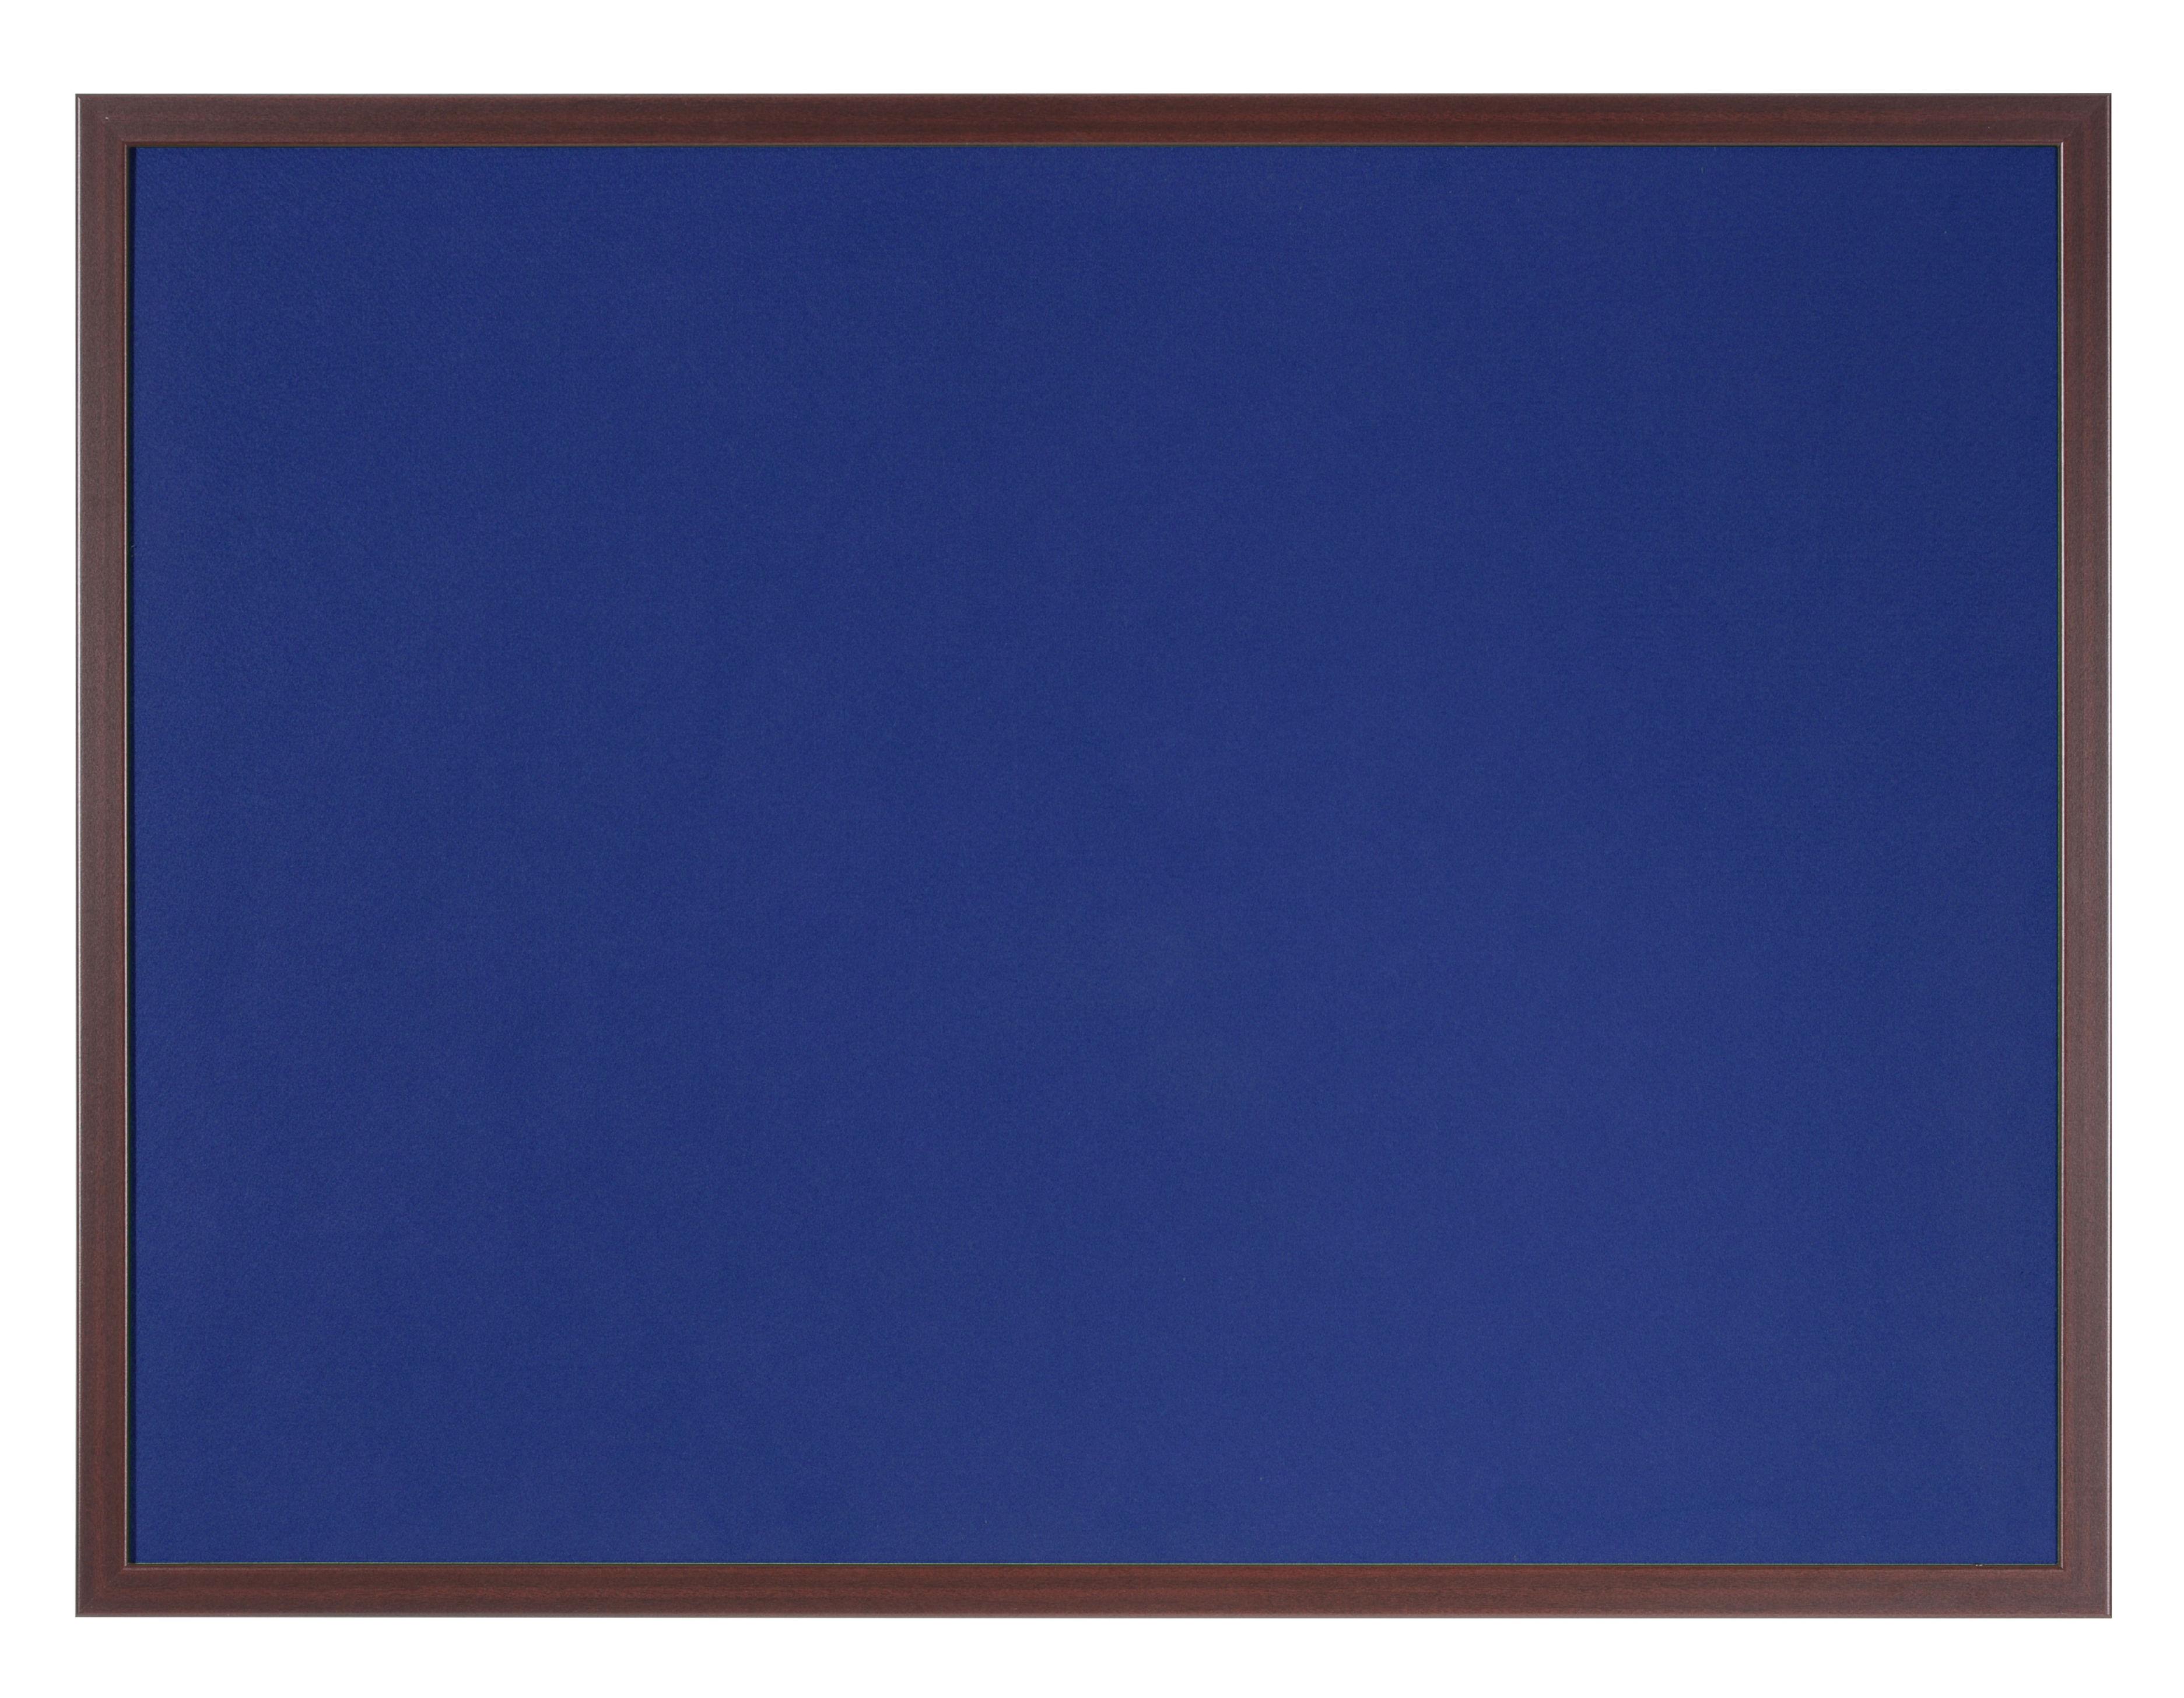 Felt Bi-Office Earth-It Blue Felt 120x90cm cherry wd 32 mm frm